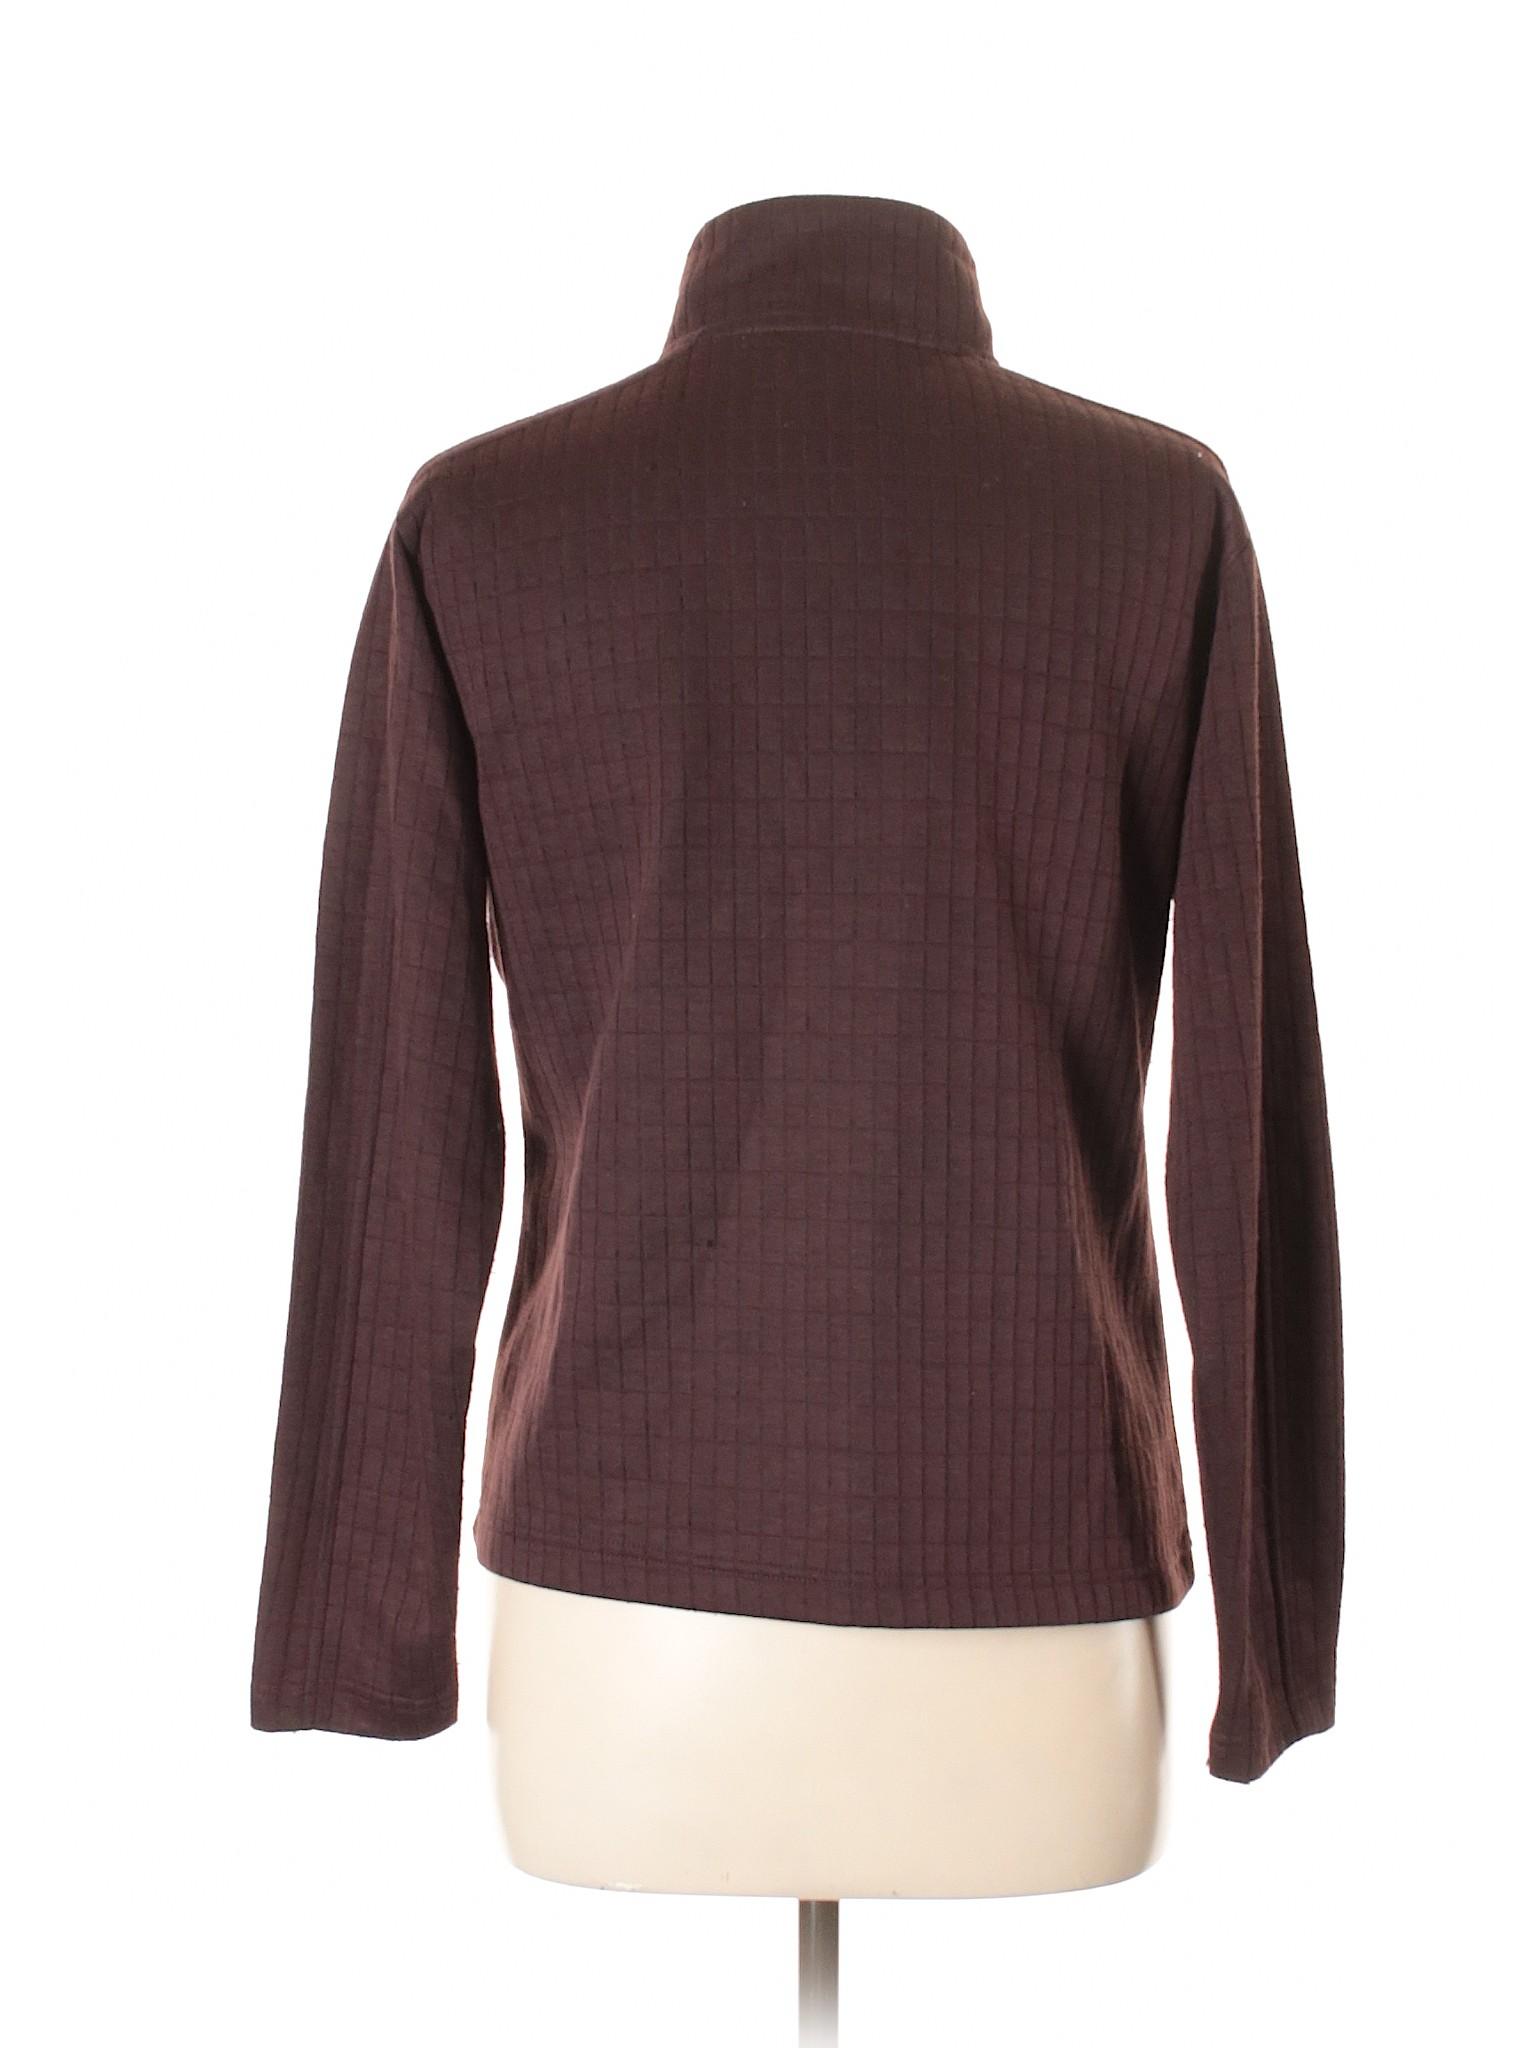 Jacket leisure Blass Boutique Track Bill I0zYx7v